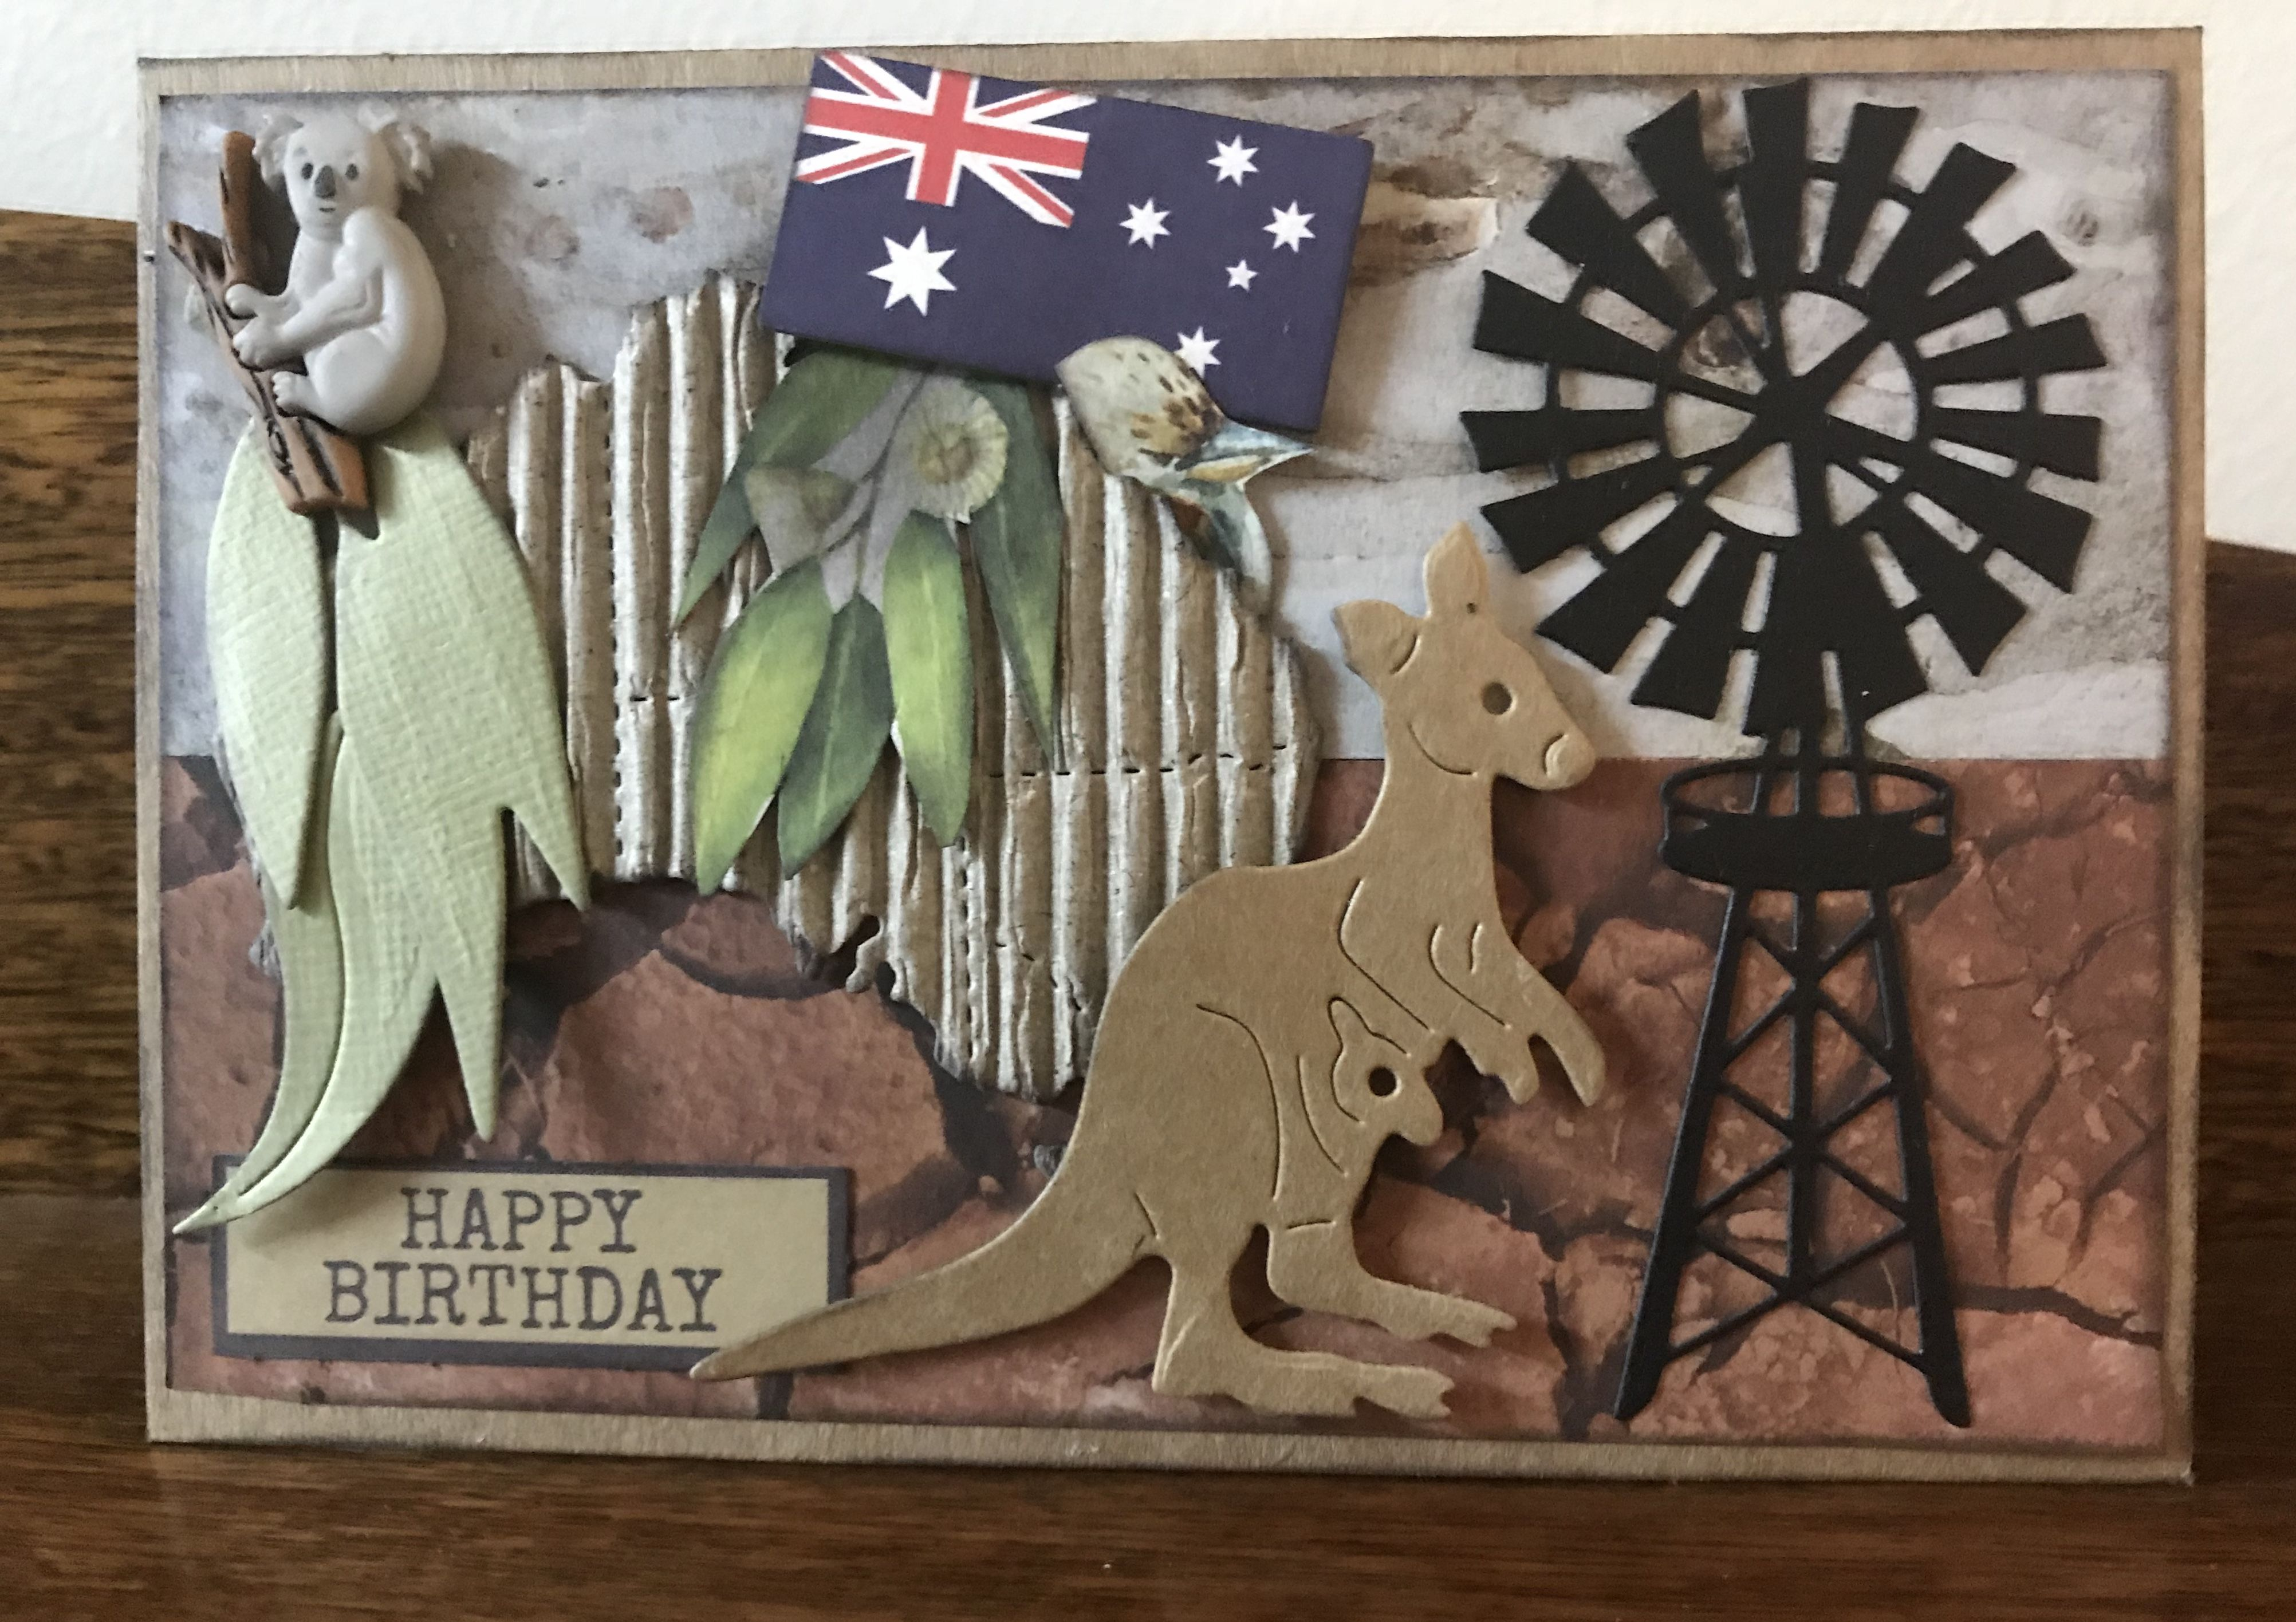 Australian Themed Birthday Card Cards Handmade Stamping Up Cards Xmas Cards